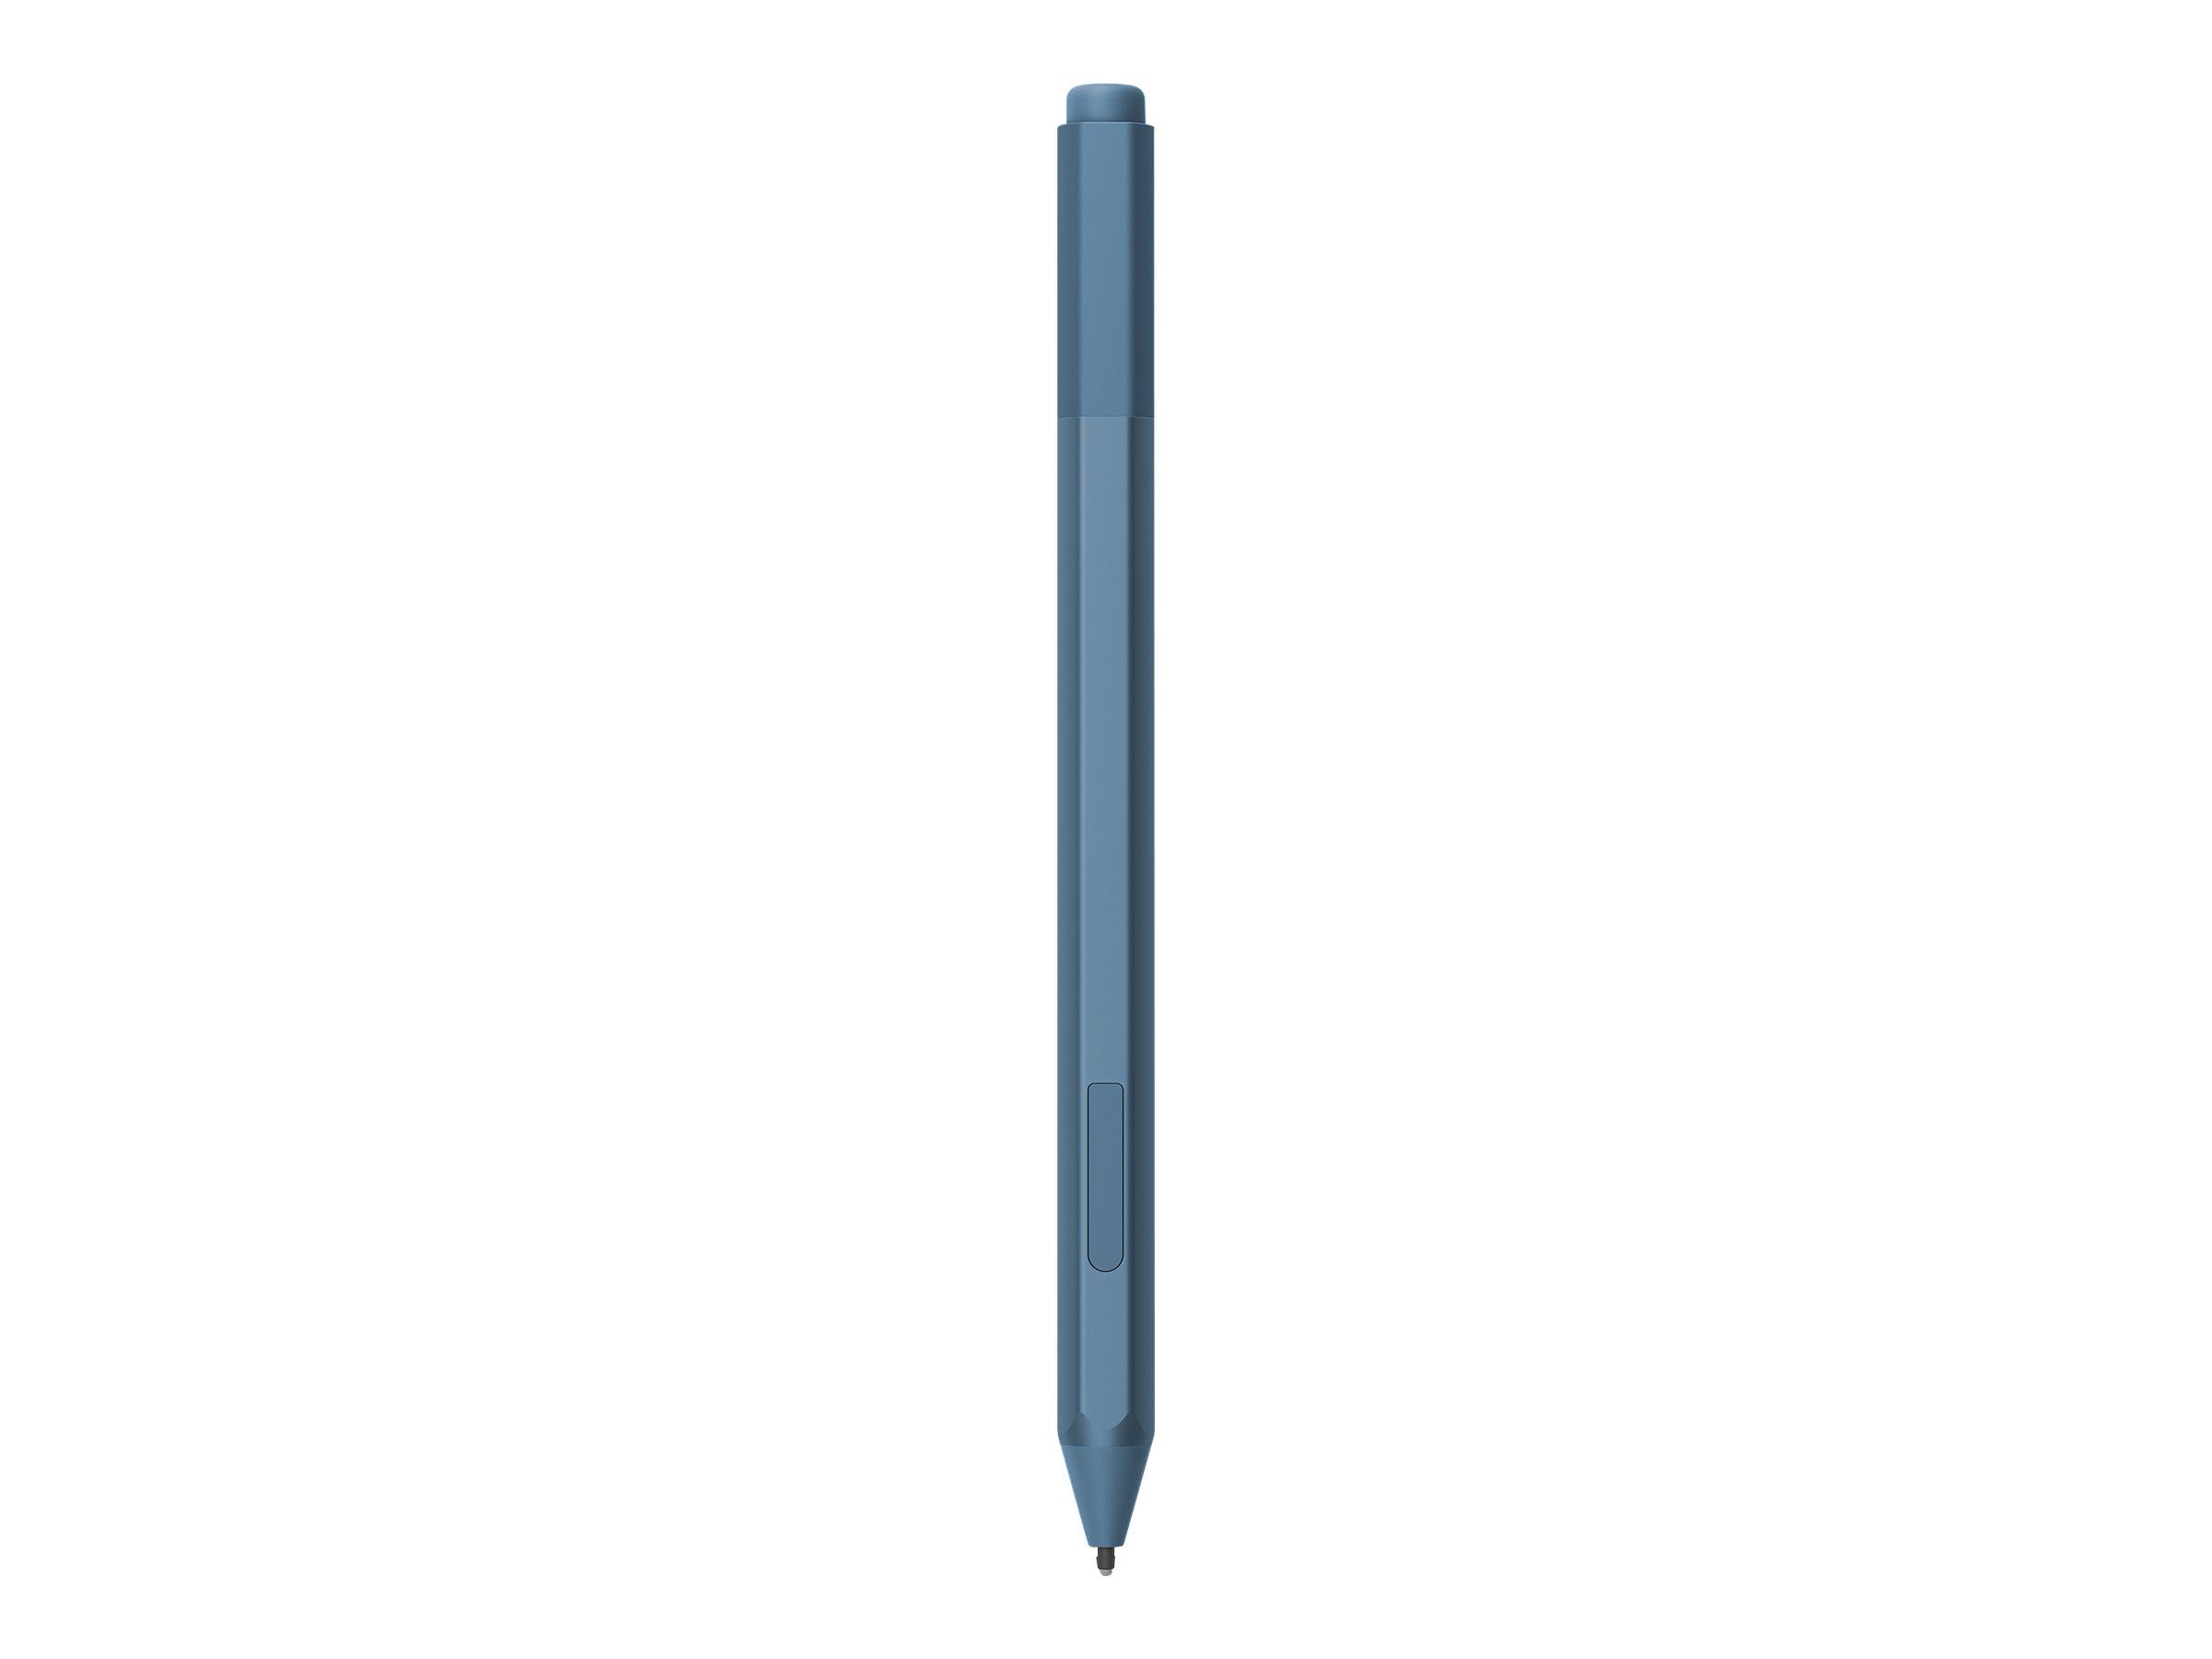 Microsoft Surface Pen - Stift - 2 Tasten - kabellos